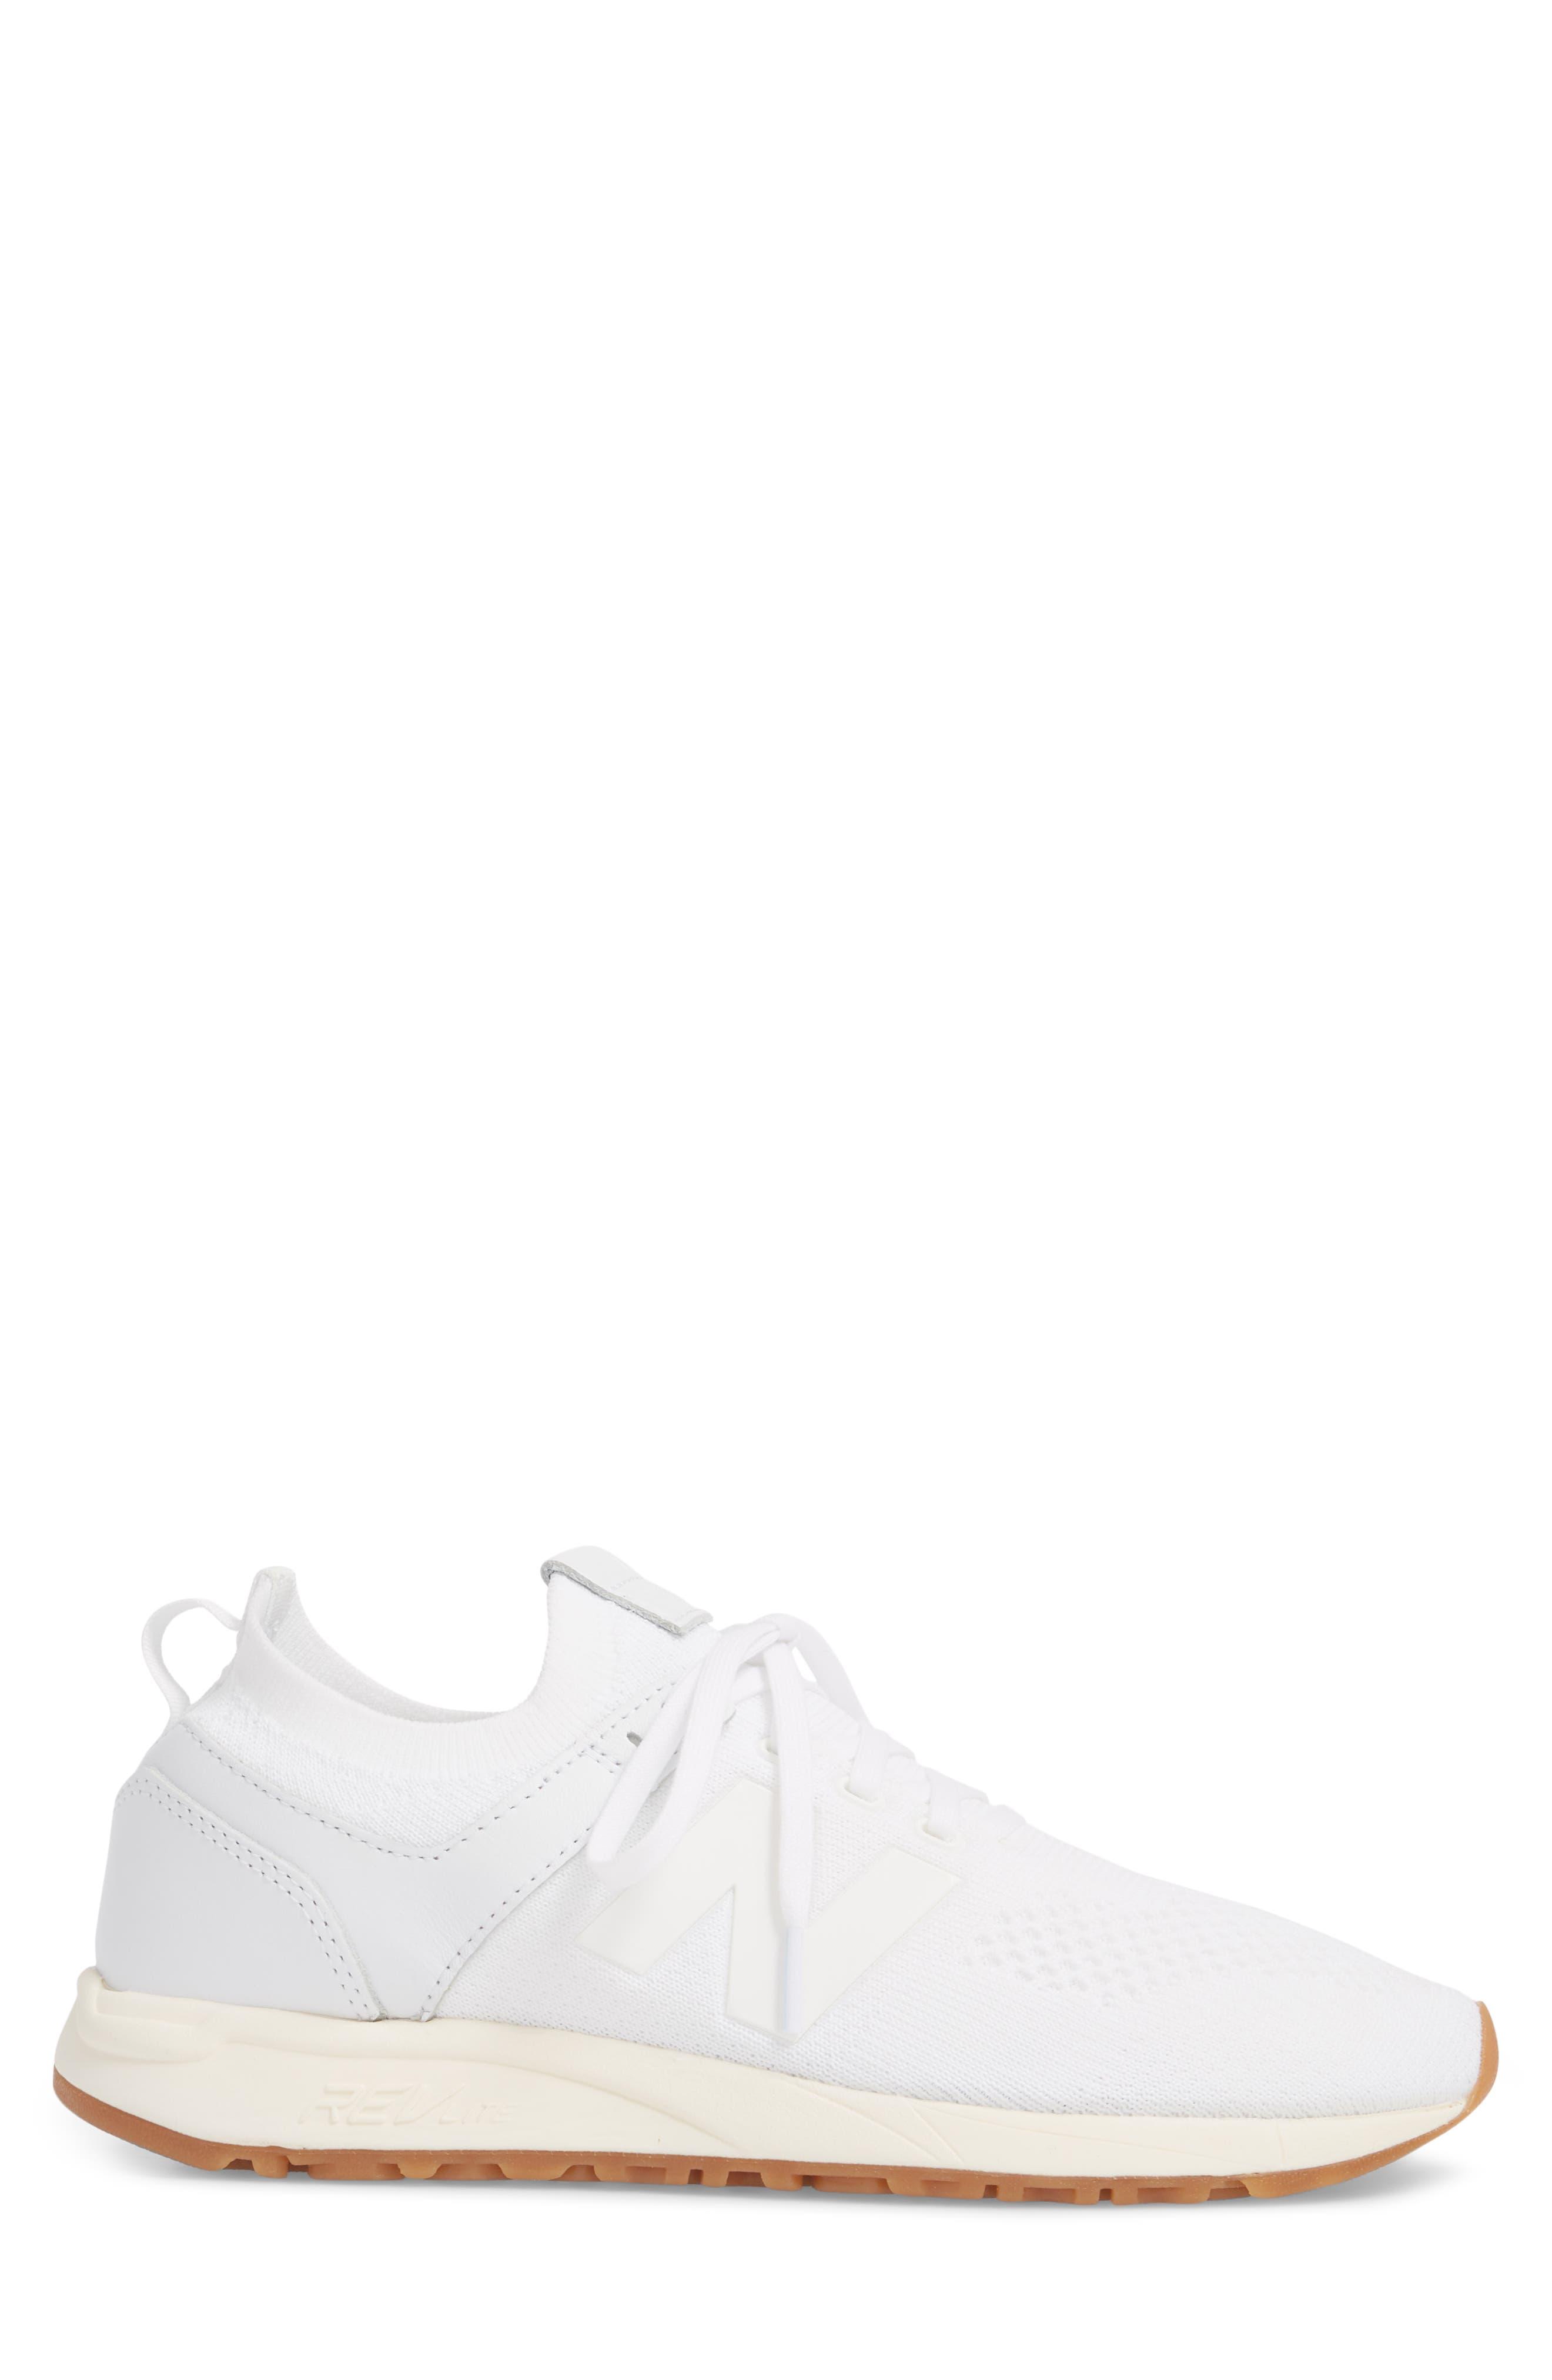 Alternate Image 3  - New Balance 247 Decon Knit Sneaker (Men)